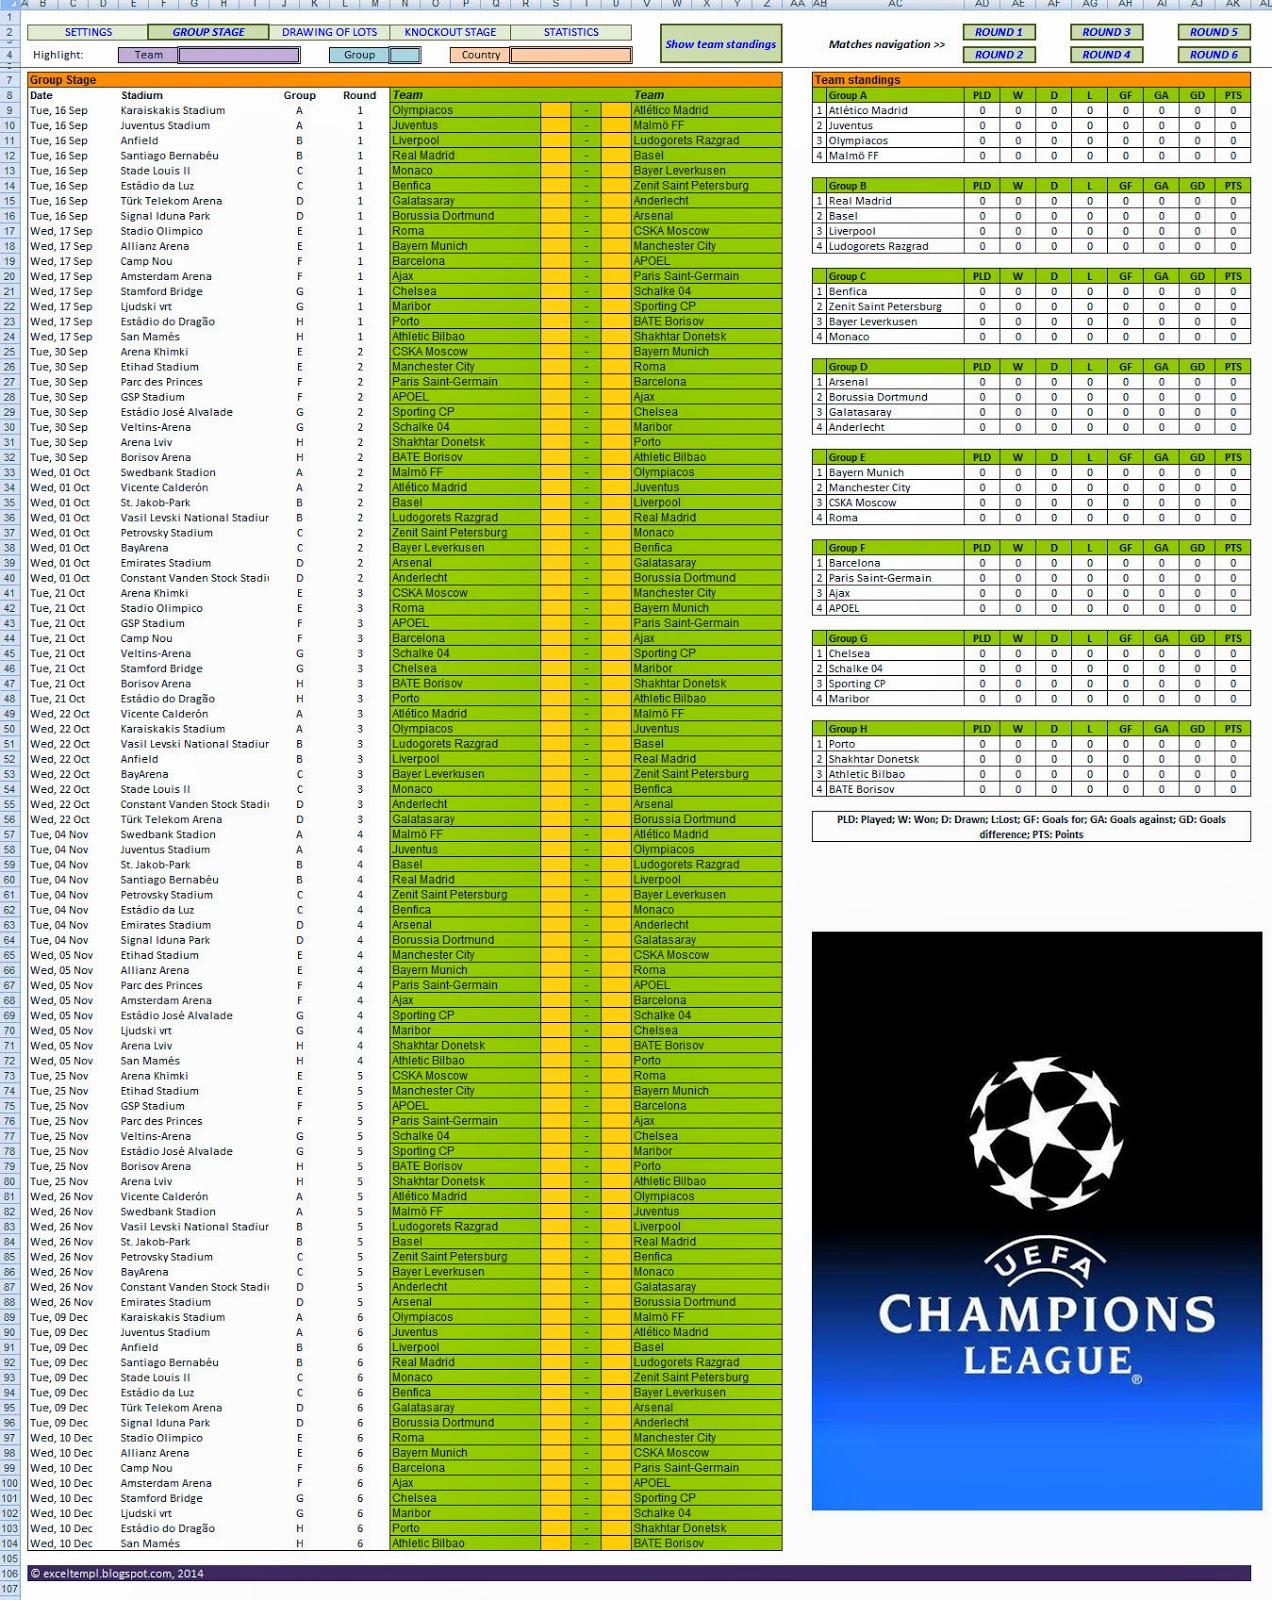 Excel Templates: 2014-15 UEFA Champions League schedule spreadsheet